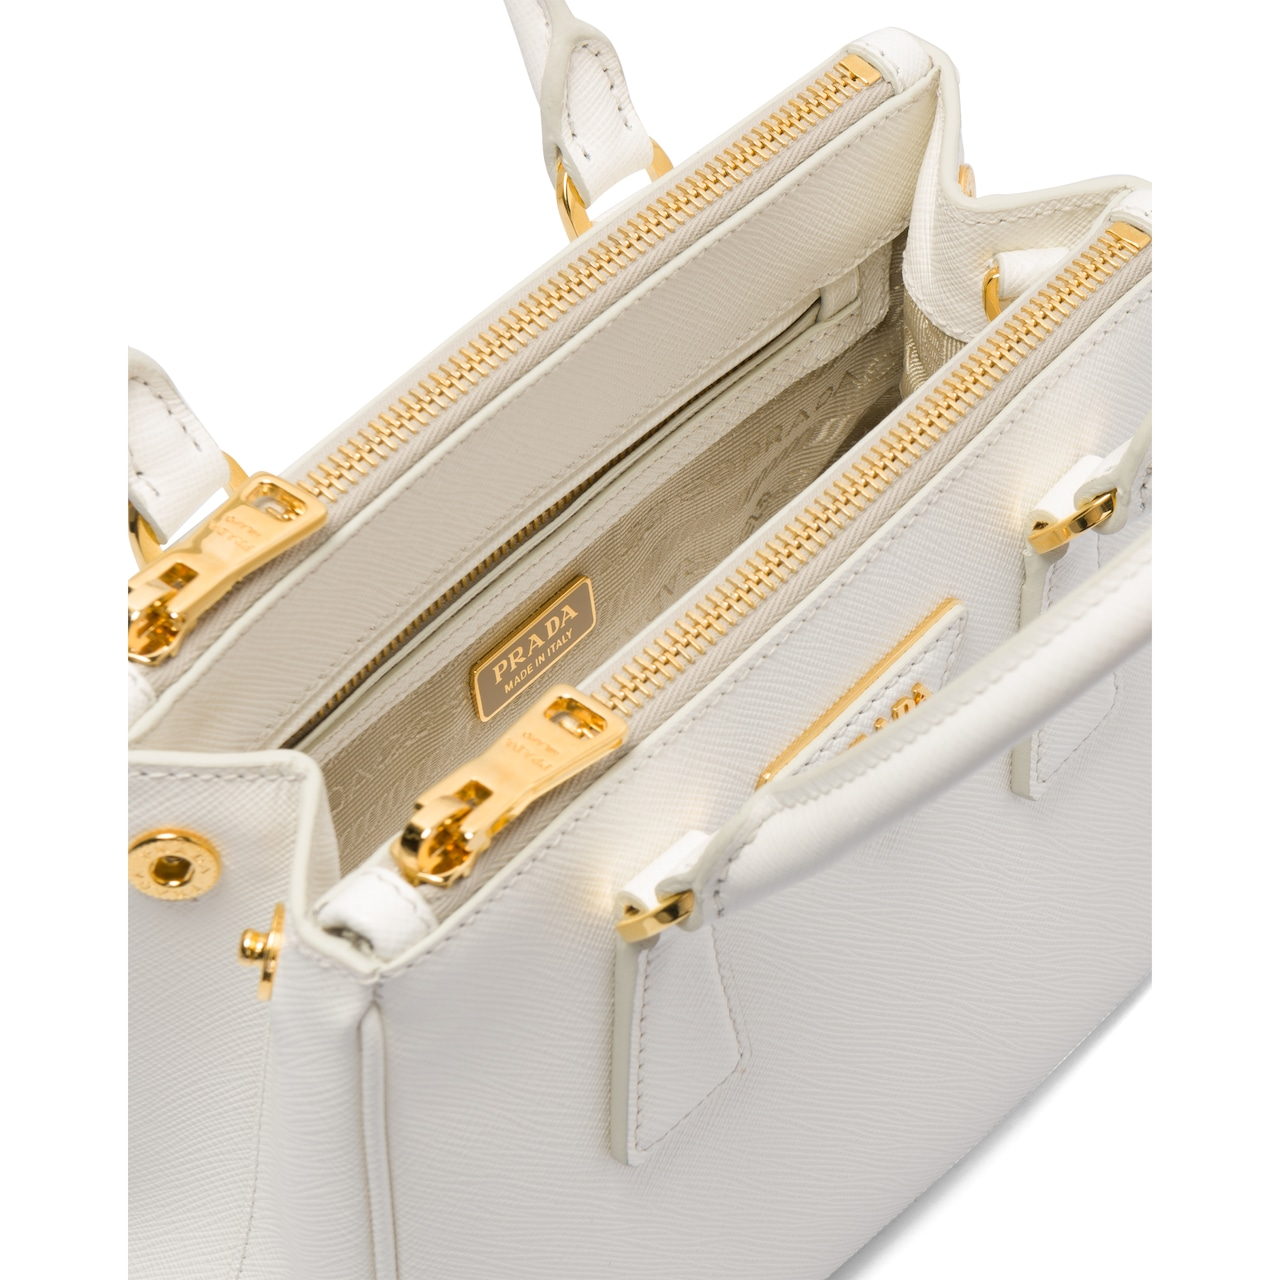 Prada Prada Galleria Saffiano leather micro-bag 5